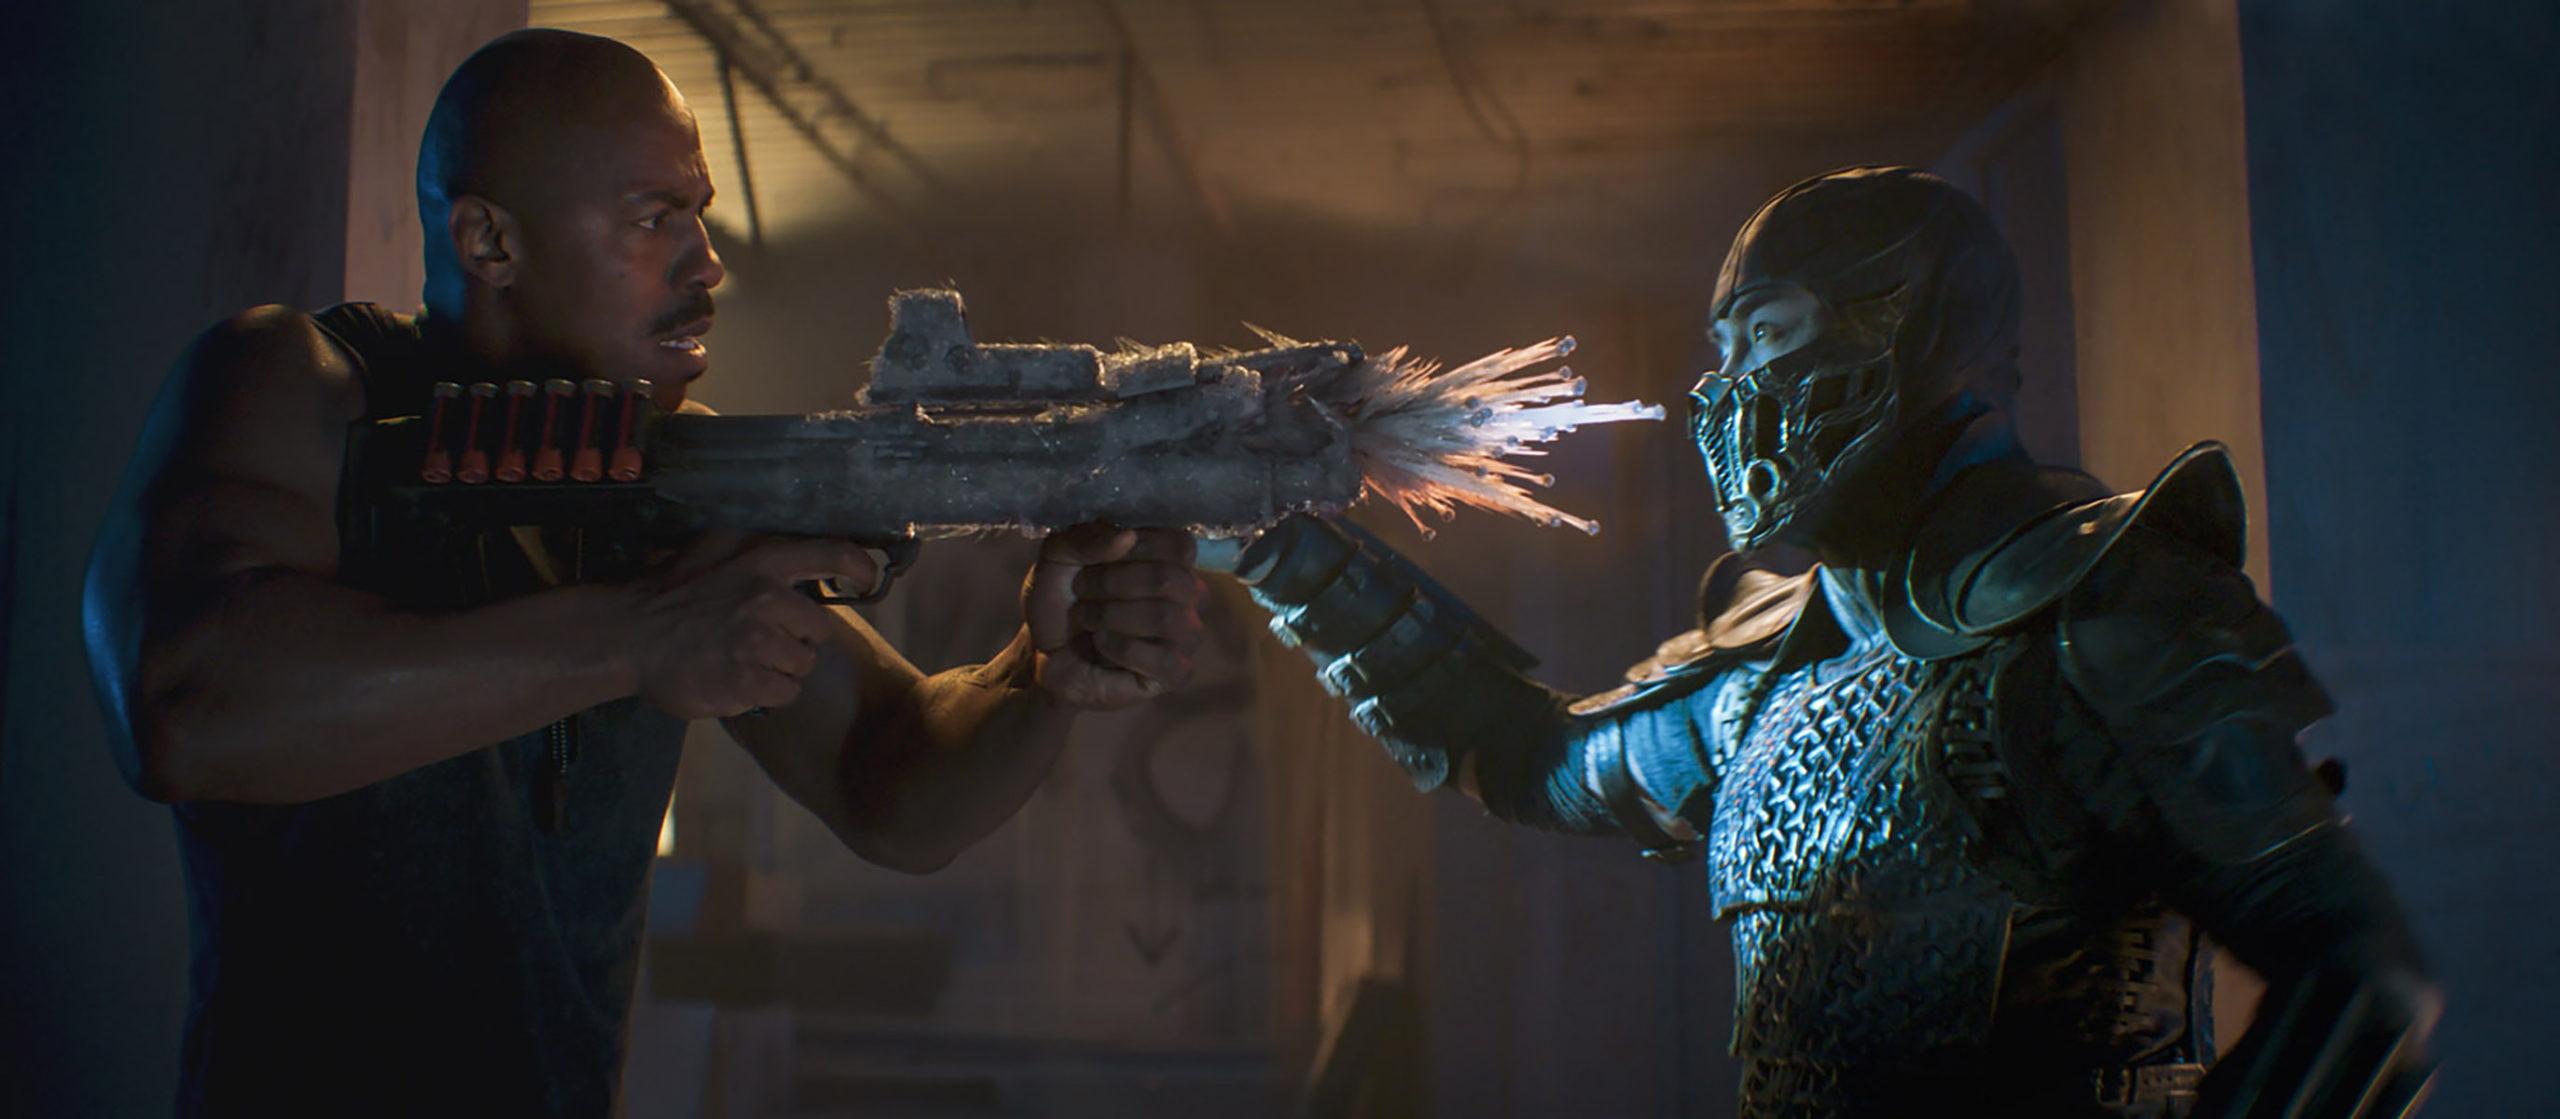 Film Review of Mortal Kombat starring Mehcad Brooks as Jax and Joe Taslim as Sub-Zero